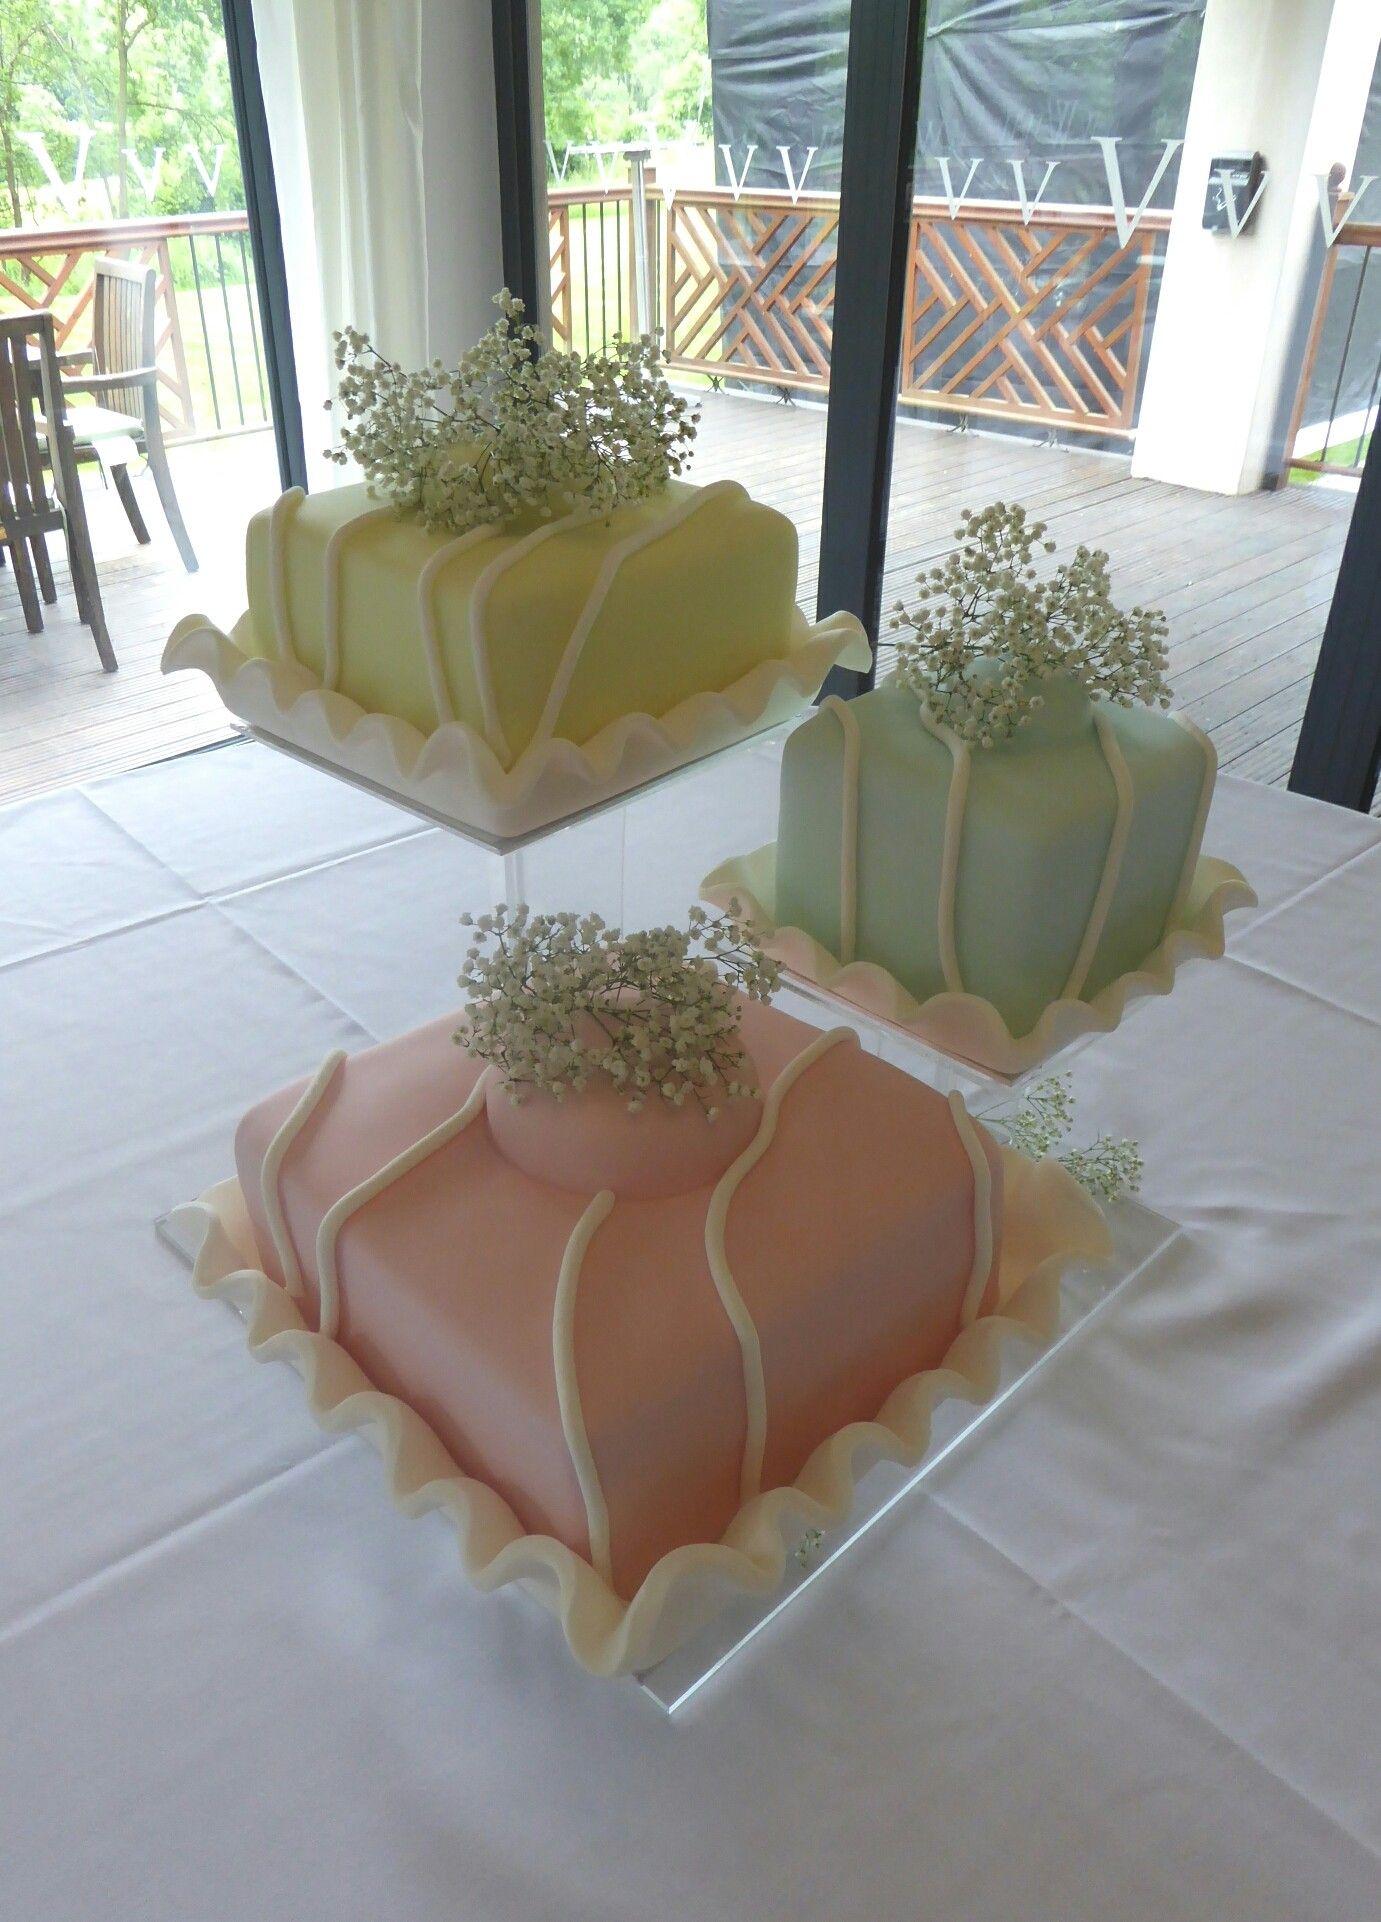 Giant French Fancy Cakes For A Wedding Celebration Farm Cake